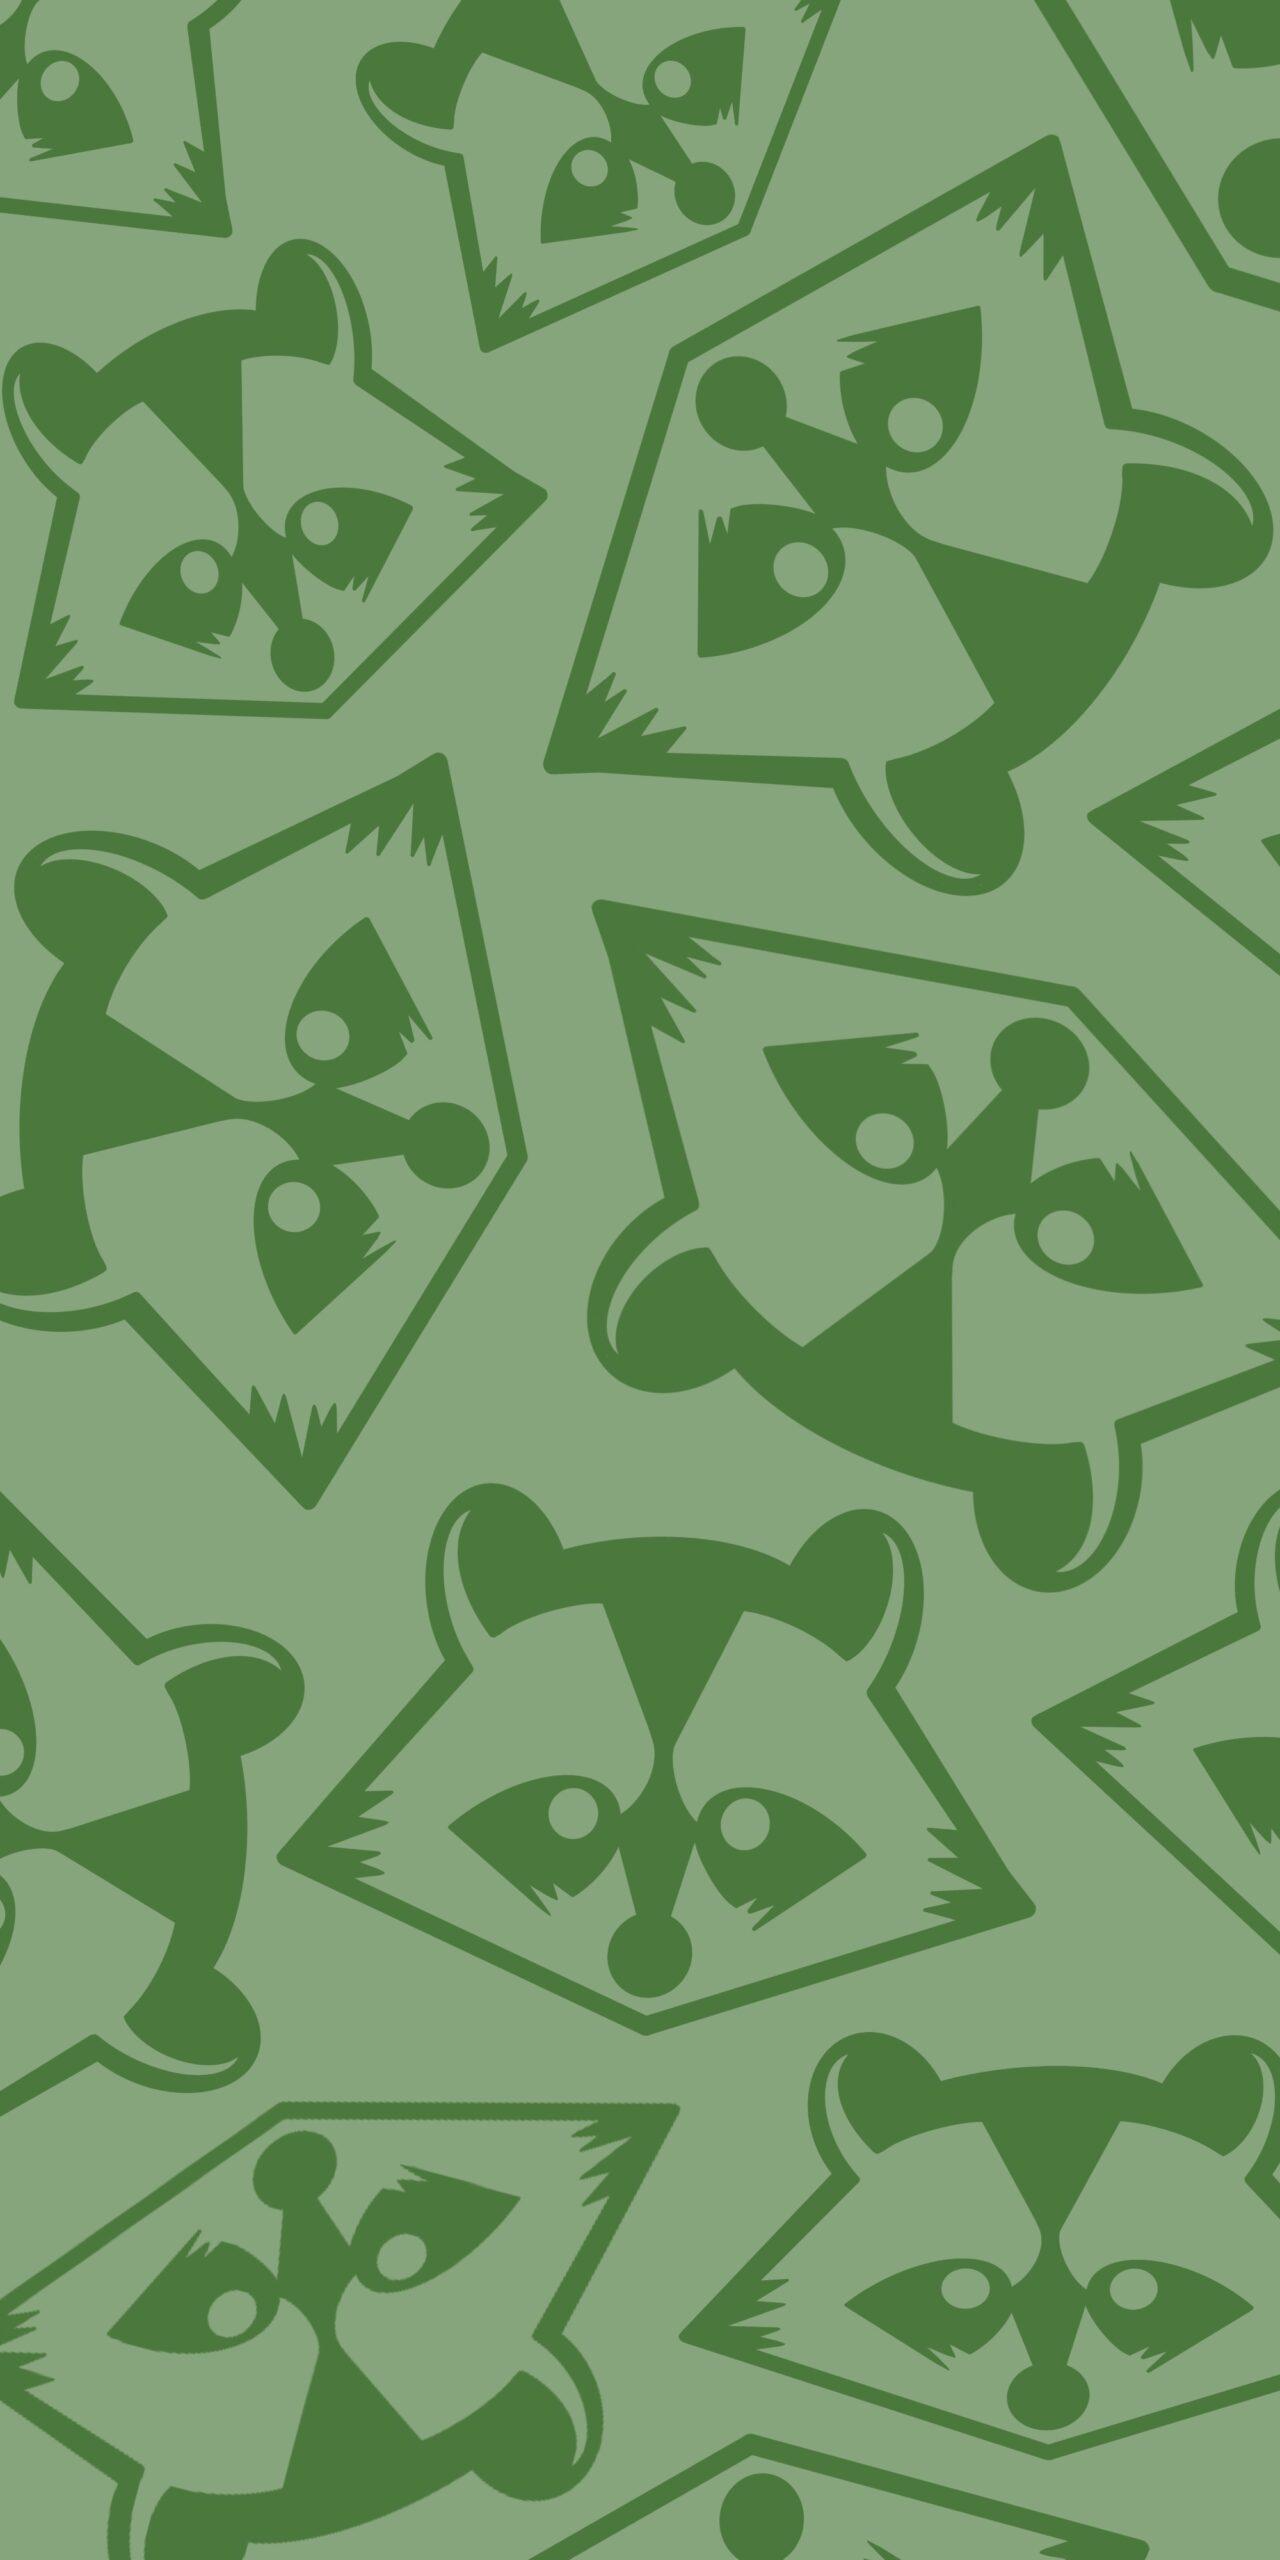 raccoon green monochrome background wallpaper